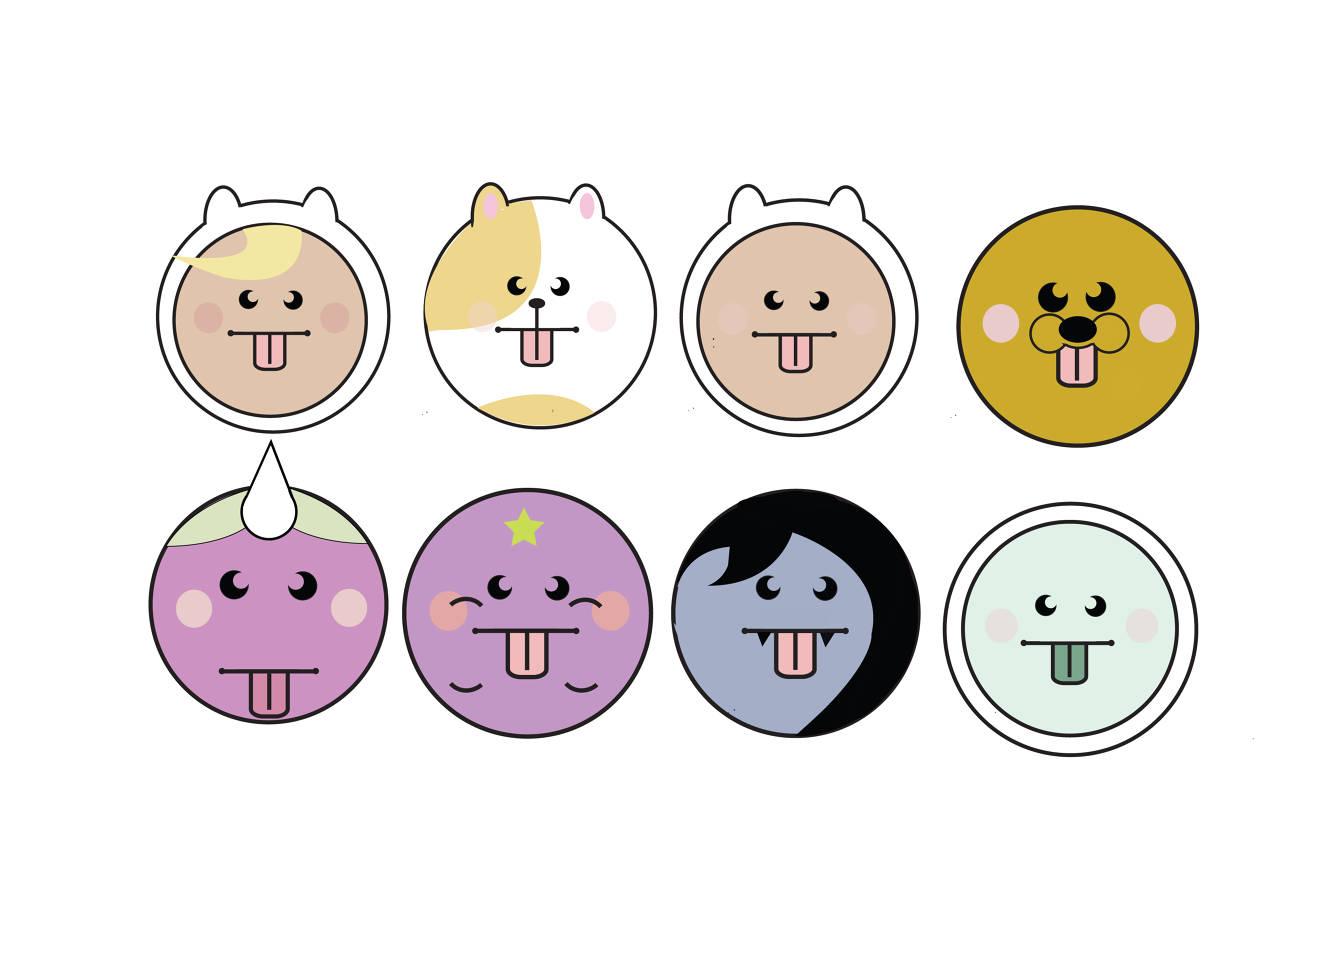 Adventure Time Emoji - michael collins